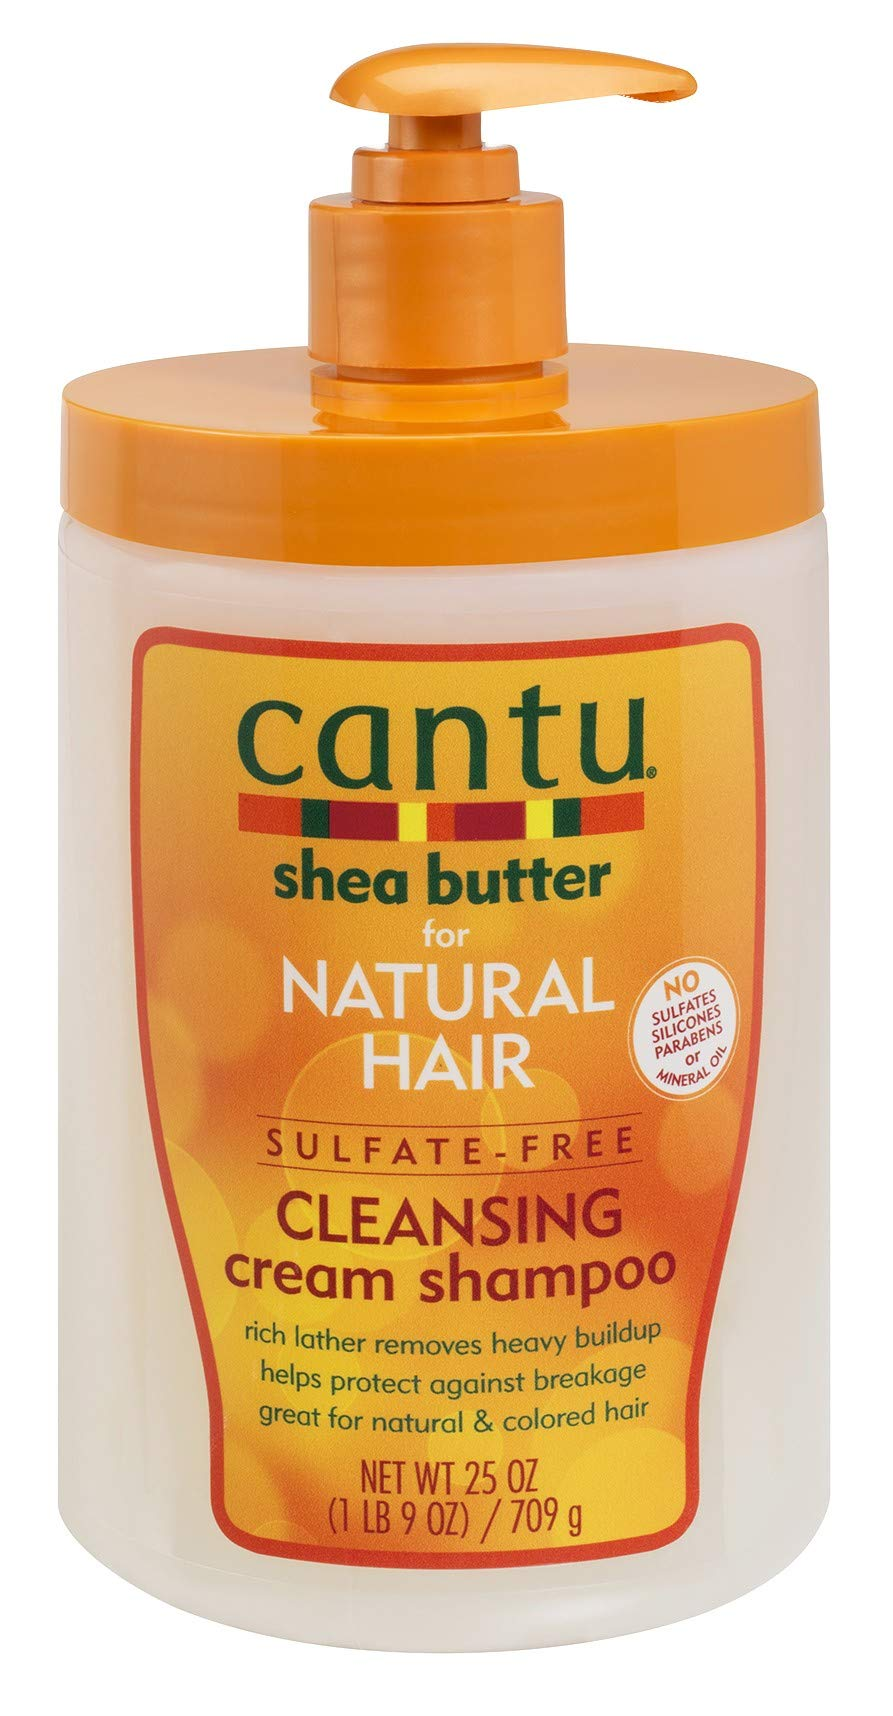 Cantu Natural Hair Shampoo Cleansing Cream 25 Ounce Pump (2 Pack) by Cantu